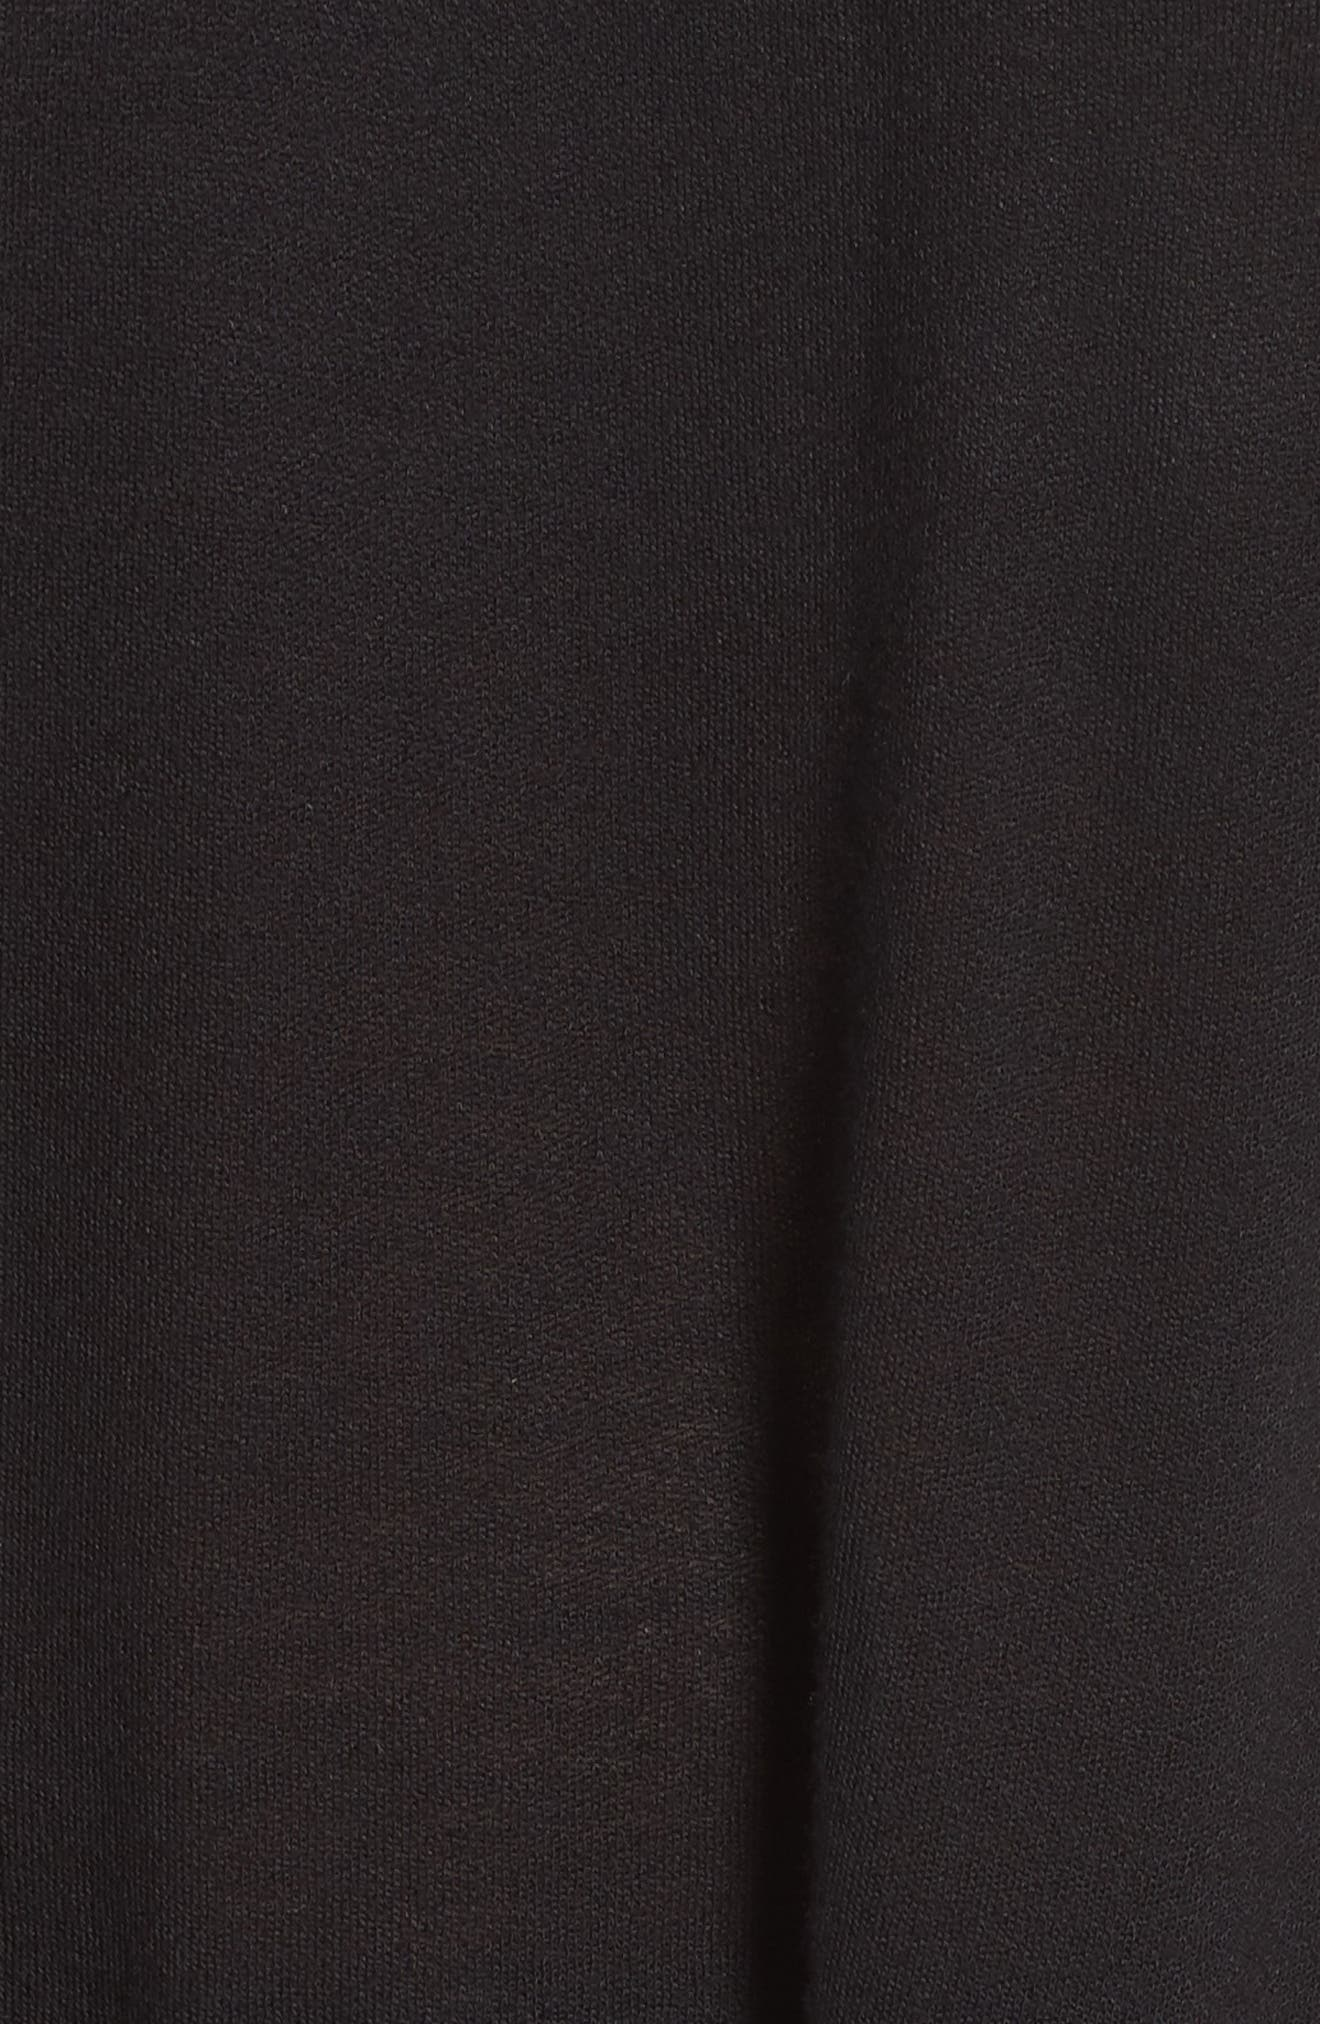 Embroidered Print Peasant Blouse,                             Alternate thumbnail 5, color,                             CREAM/ BLACK